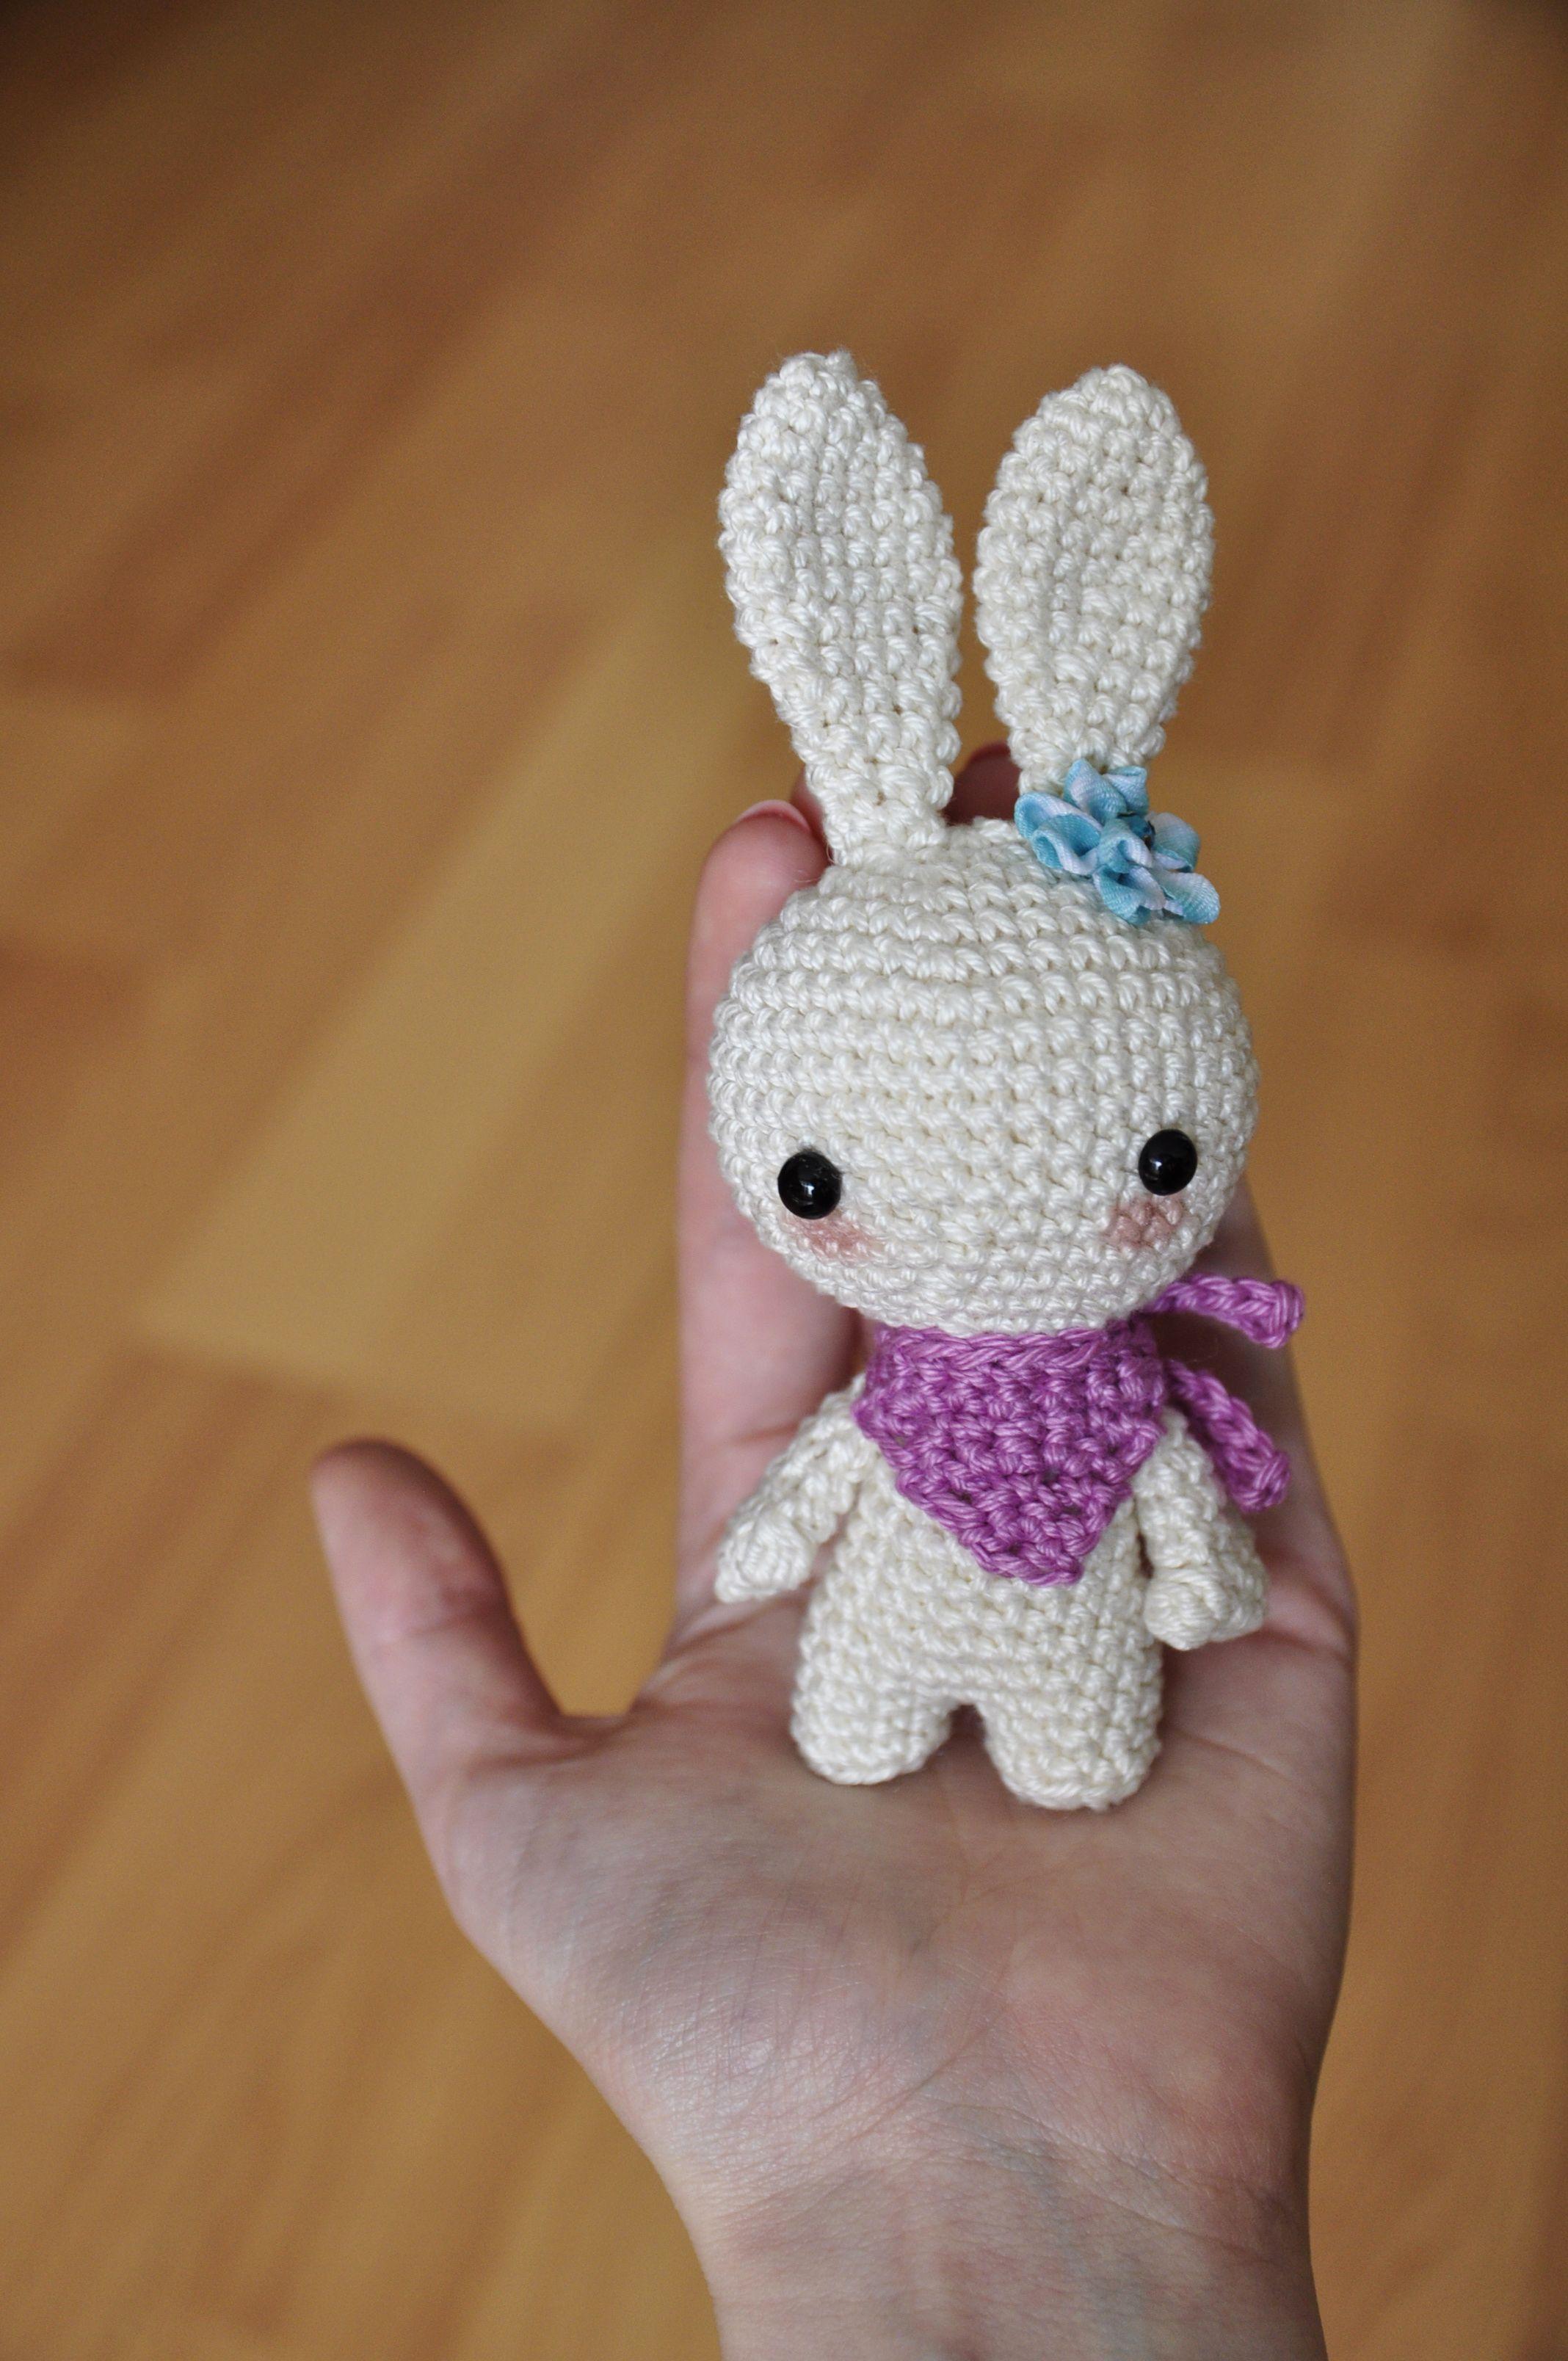 DIY Stick Eyes for Wool Needle Felt Craft Mascot / Crochet Stuff ... | 3216x2136